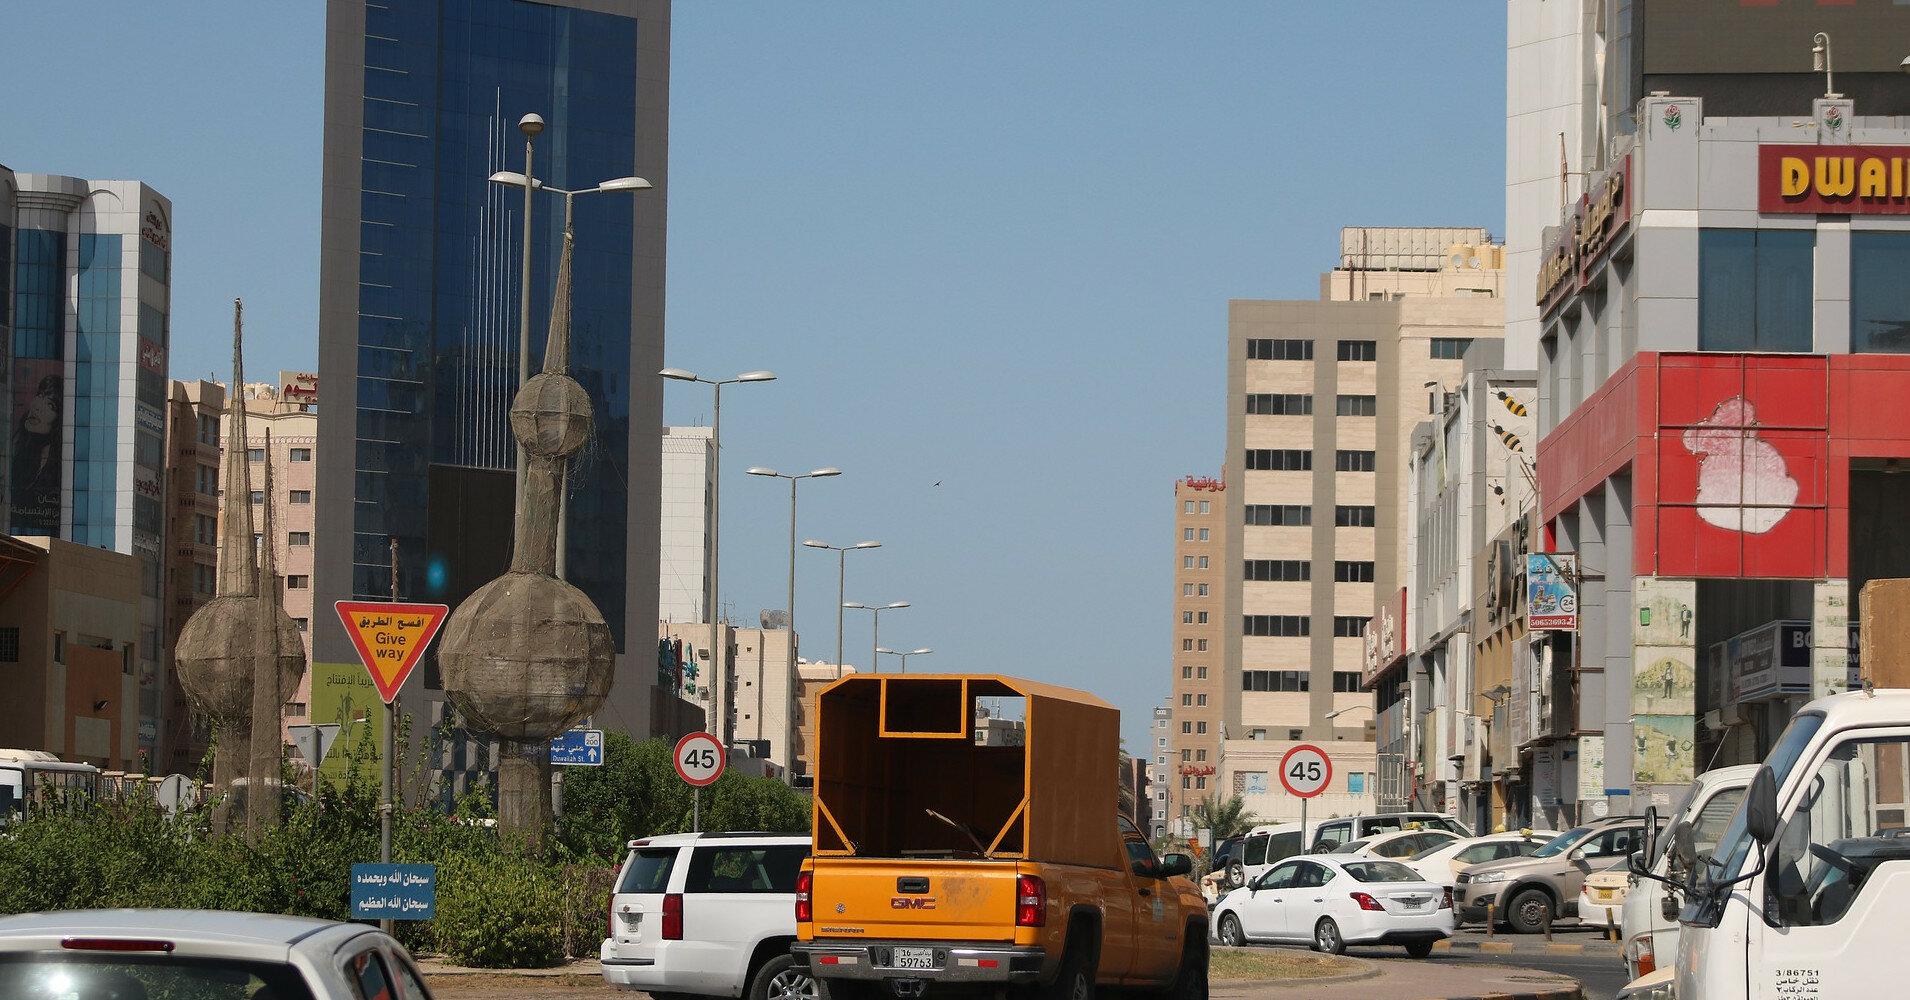 В Кувейте зарегистрировали температуру +70 градусов